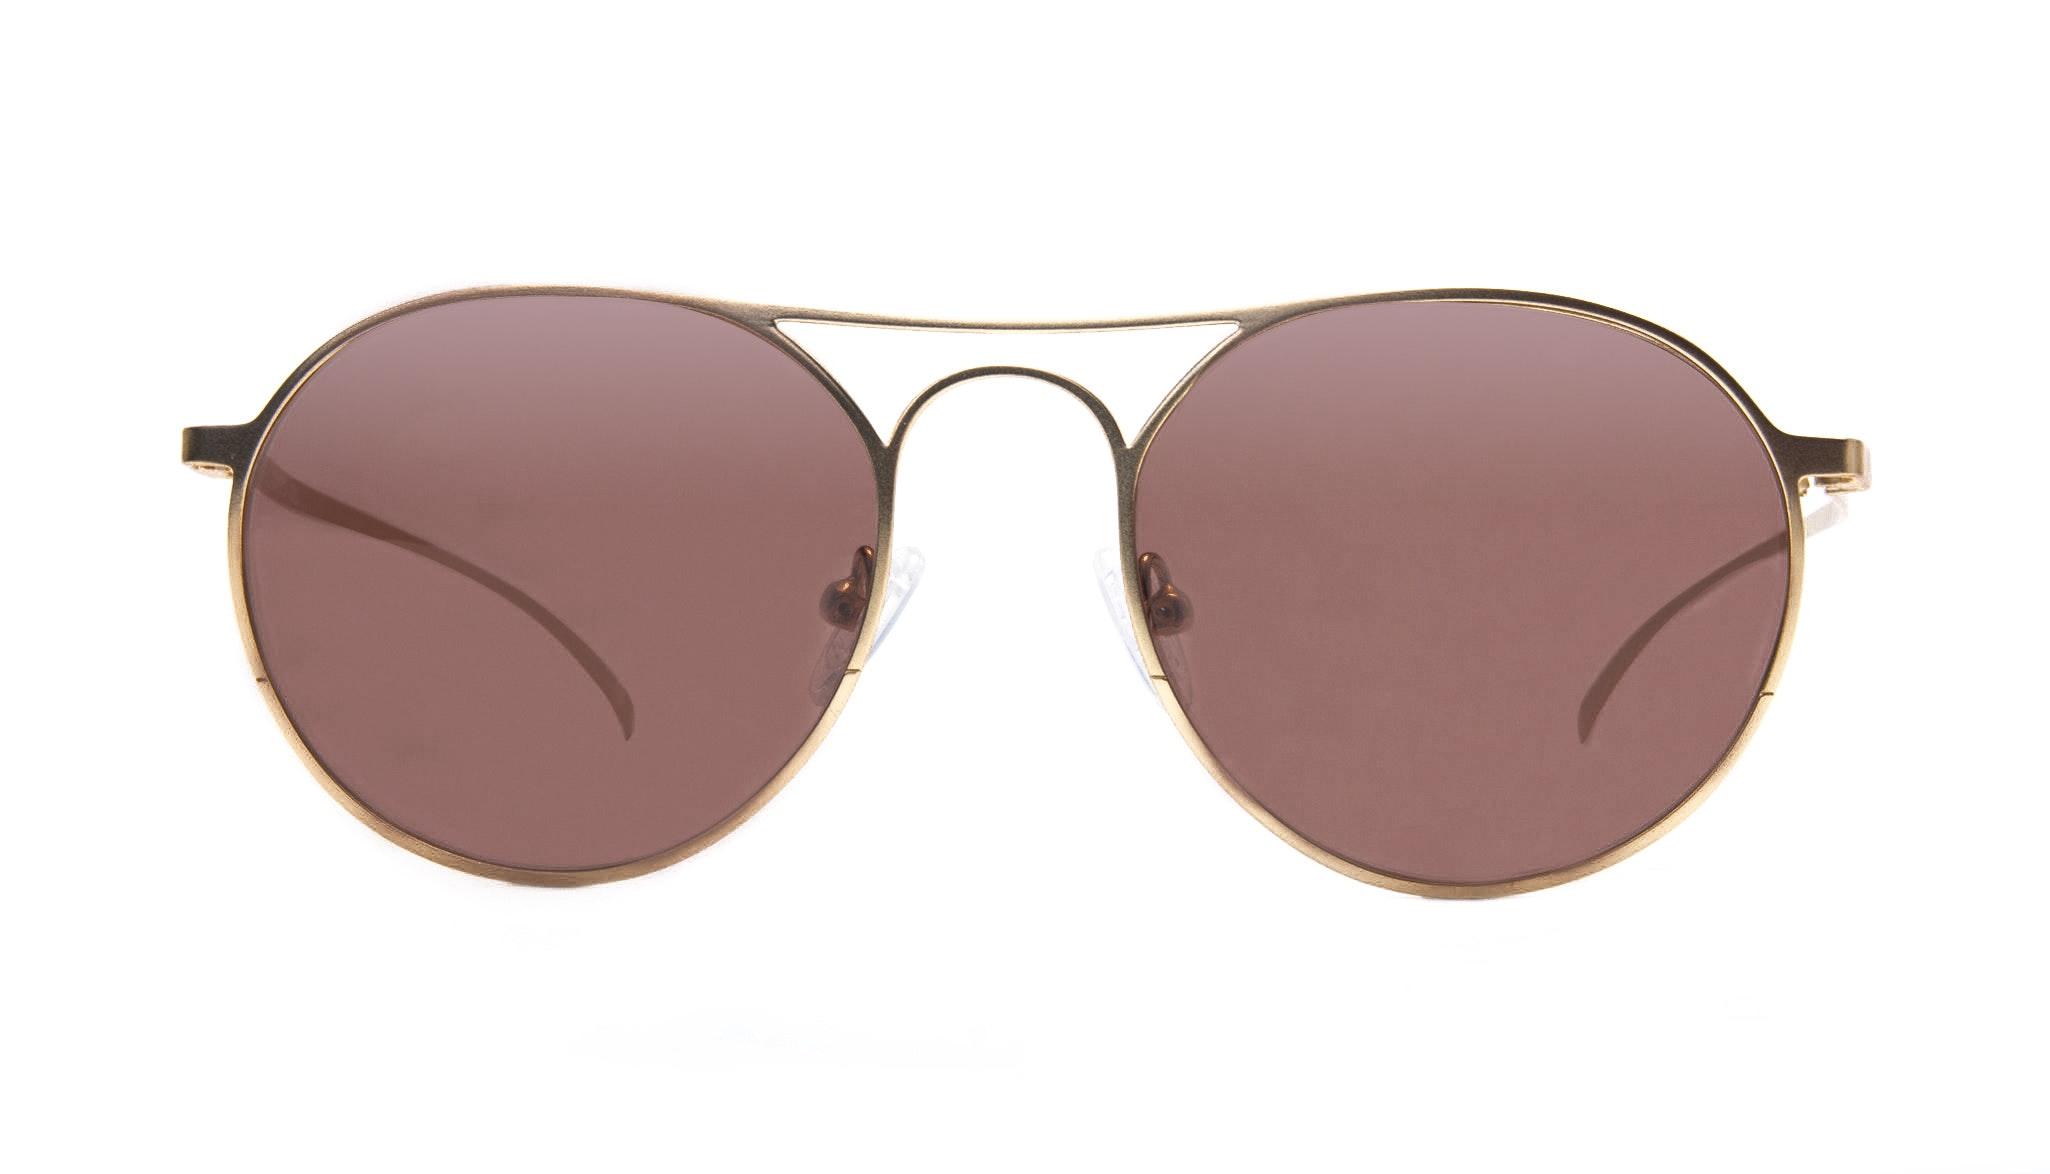 Affordable Fashion Glasses Aviator Round Sunglasses Men Contour Gold